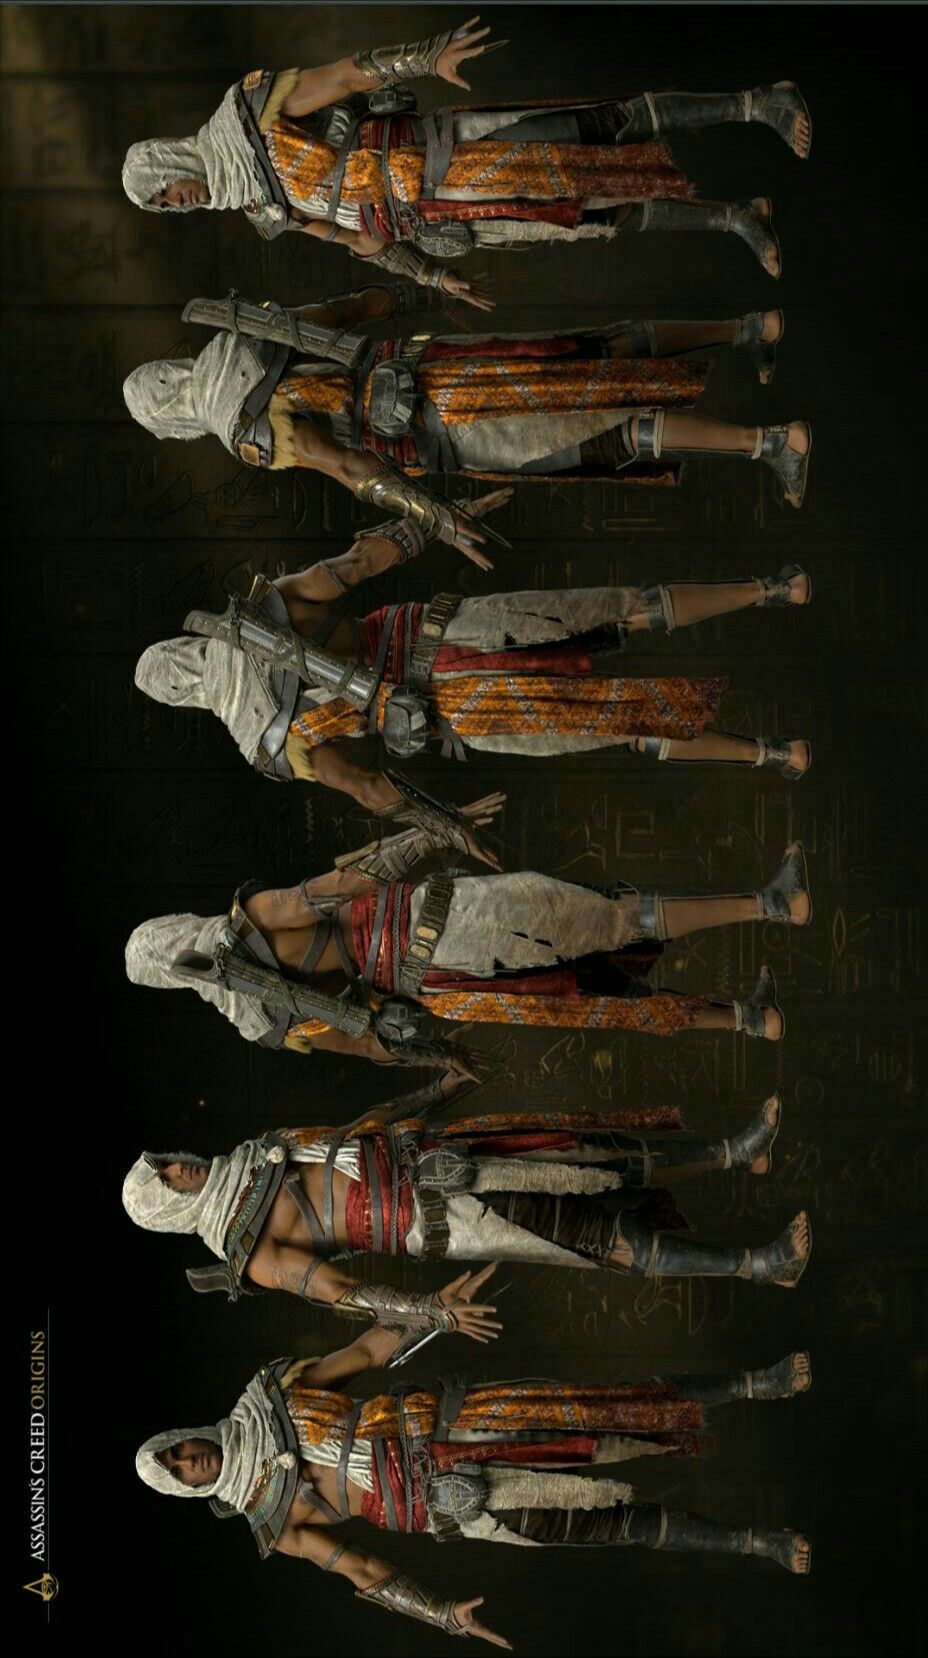 The Codex - Assassins Creed Origins - Cleopatra Cosplay Guide